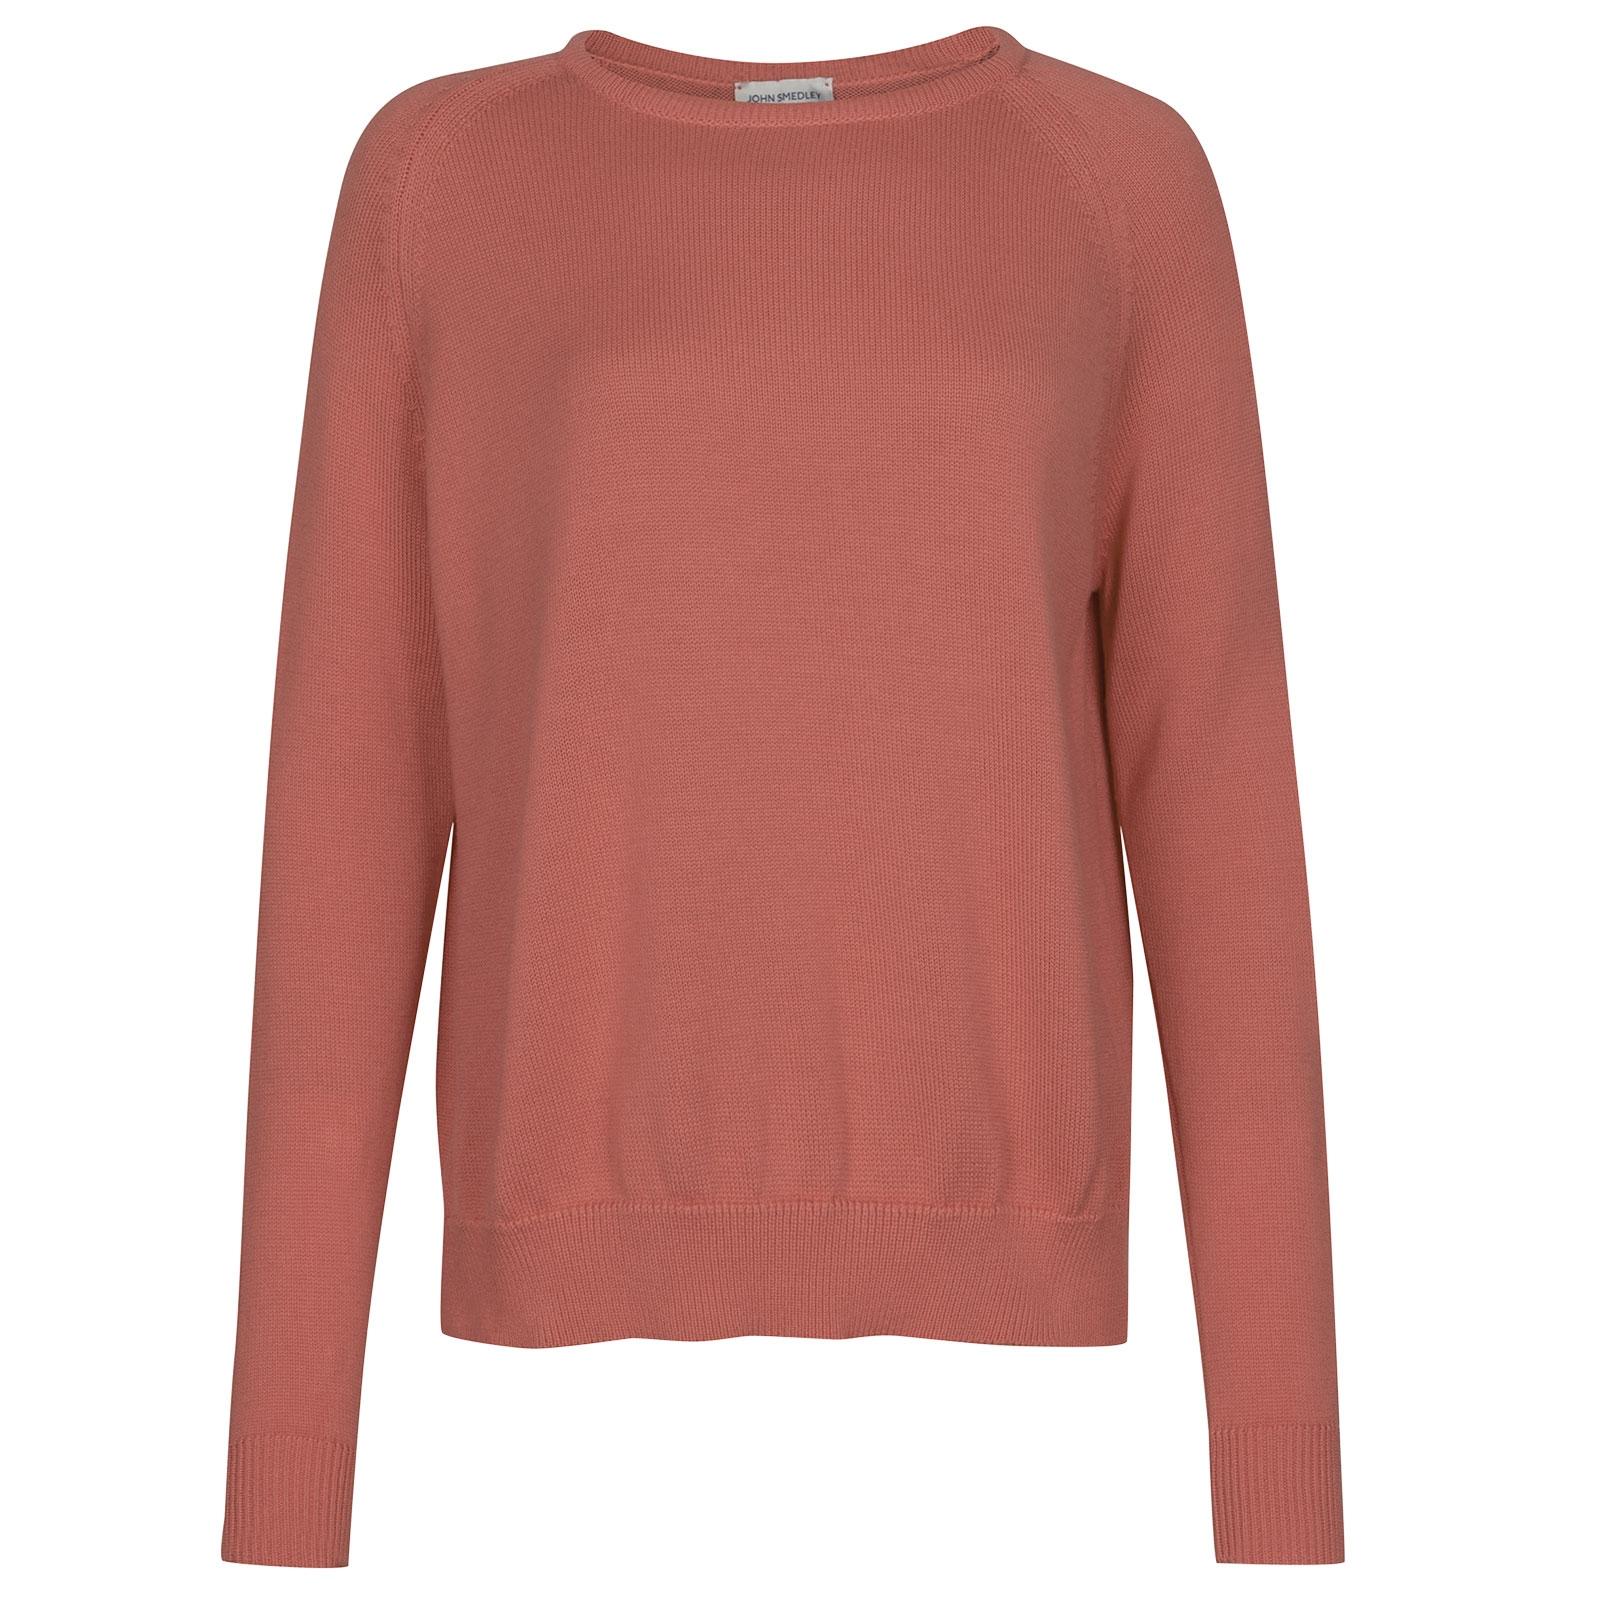 John Smedley Hoxton in Azalea Pink Sweater-LGE